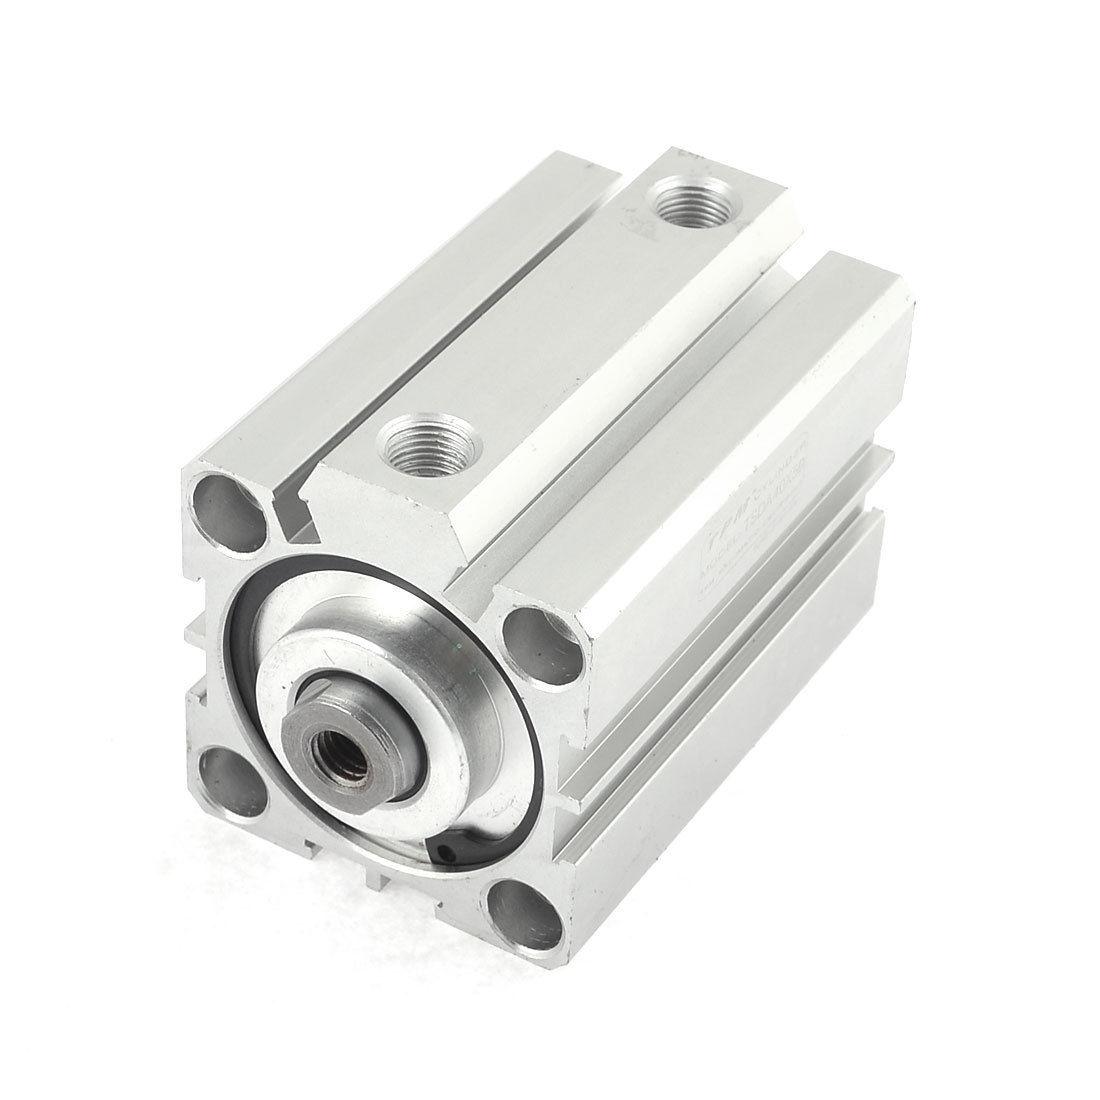 1 Pcs 40mm Bore 25mm Stroke Stainless steel Pneumatic Air Cylinder SDA40-25 1 pcs 50mm bore 25mm stroke stainless steel pneumatic air cylinder sda50 25